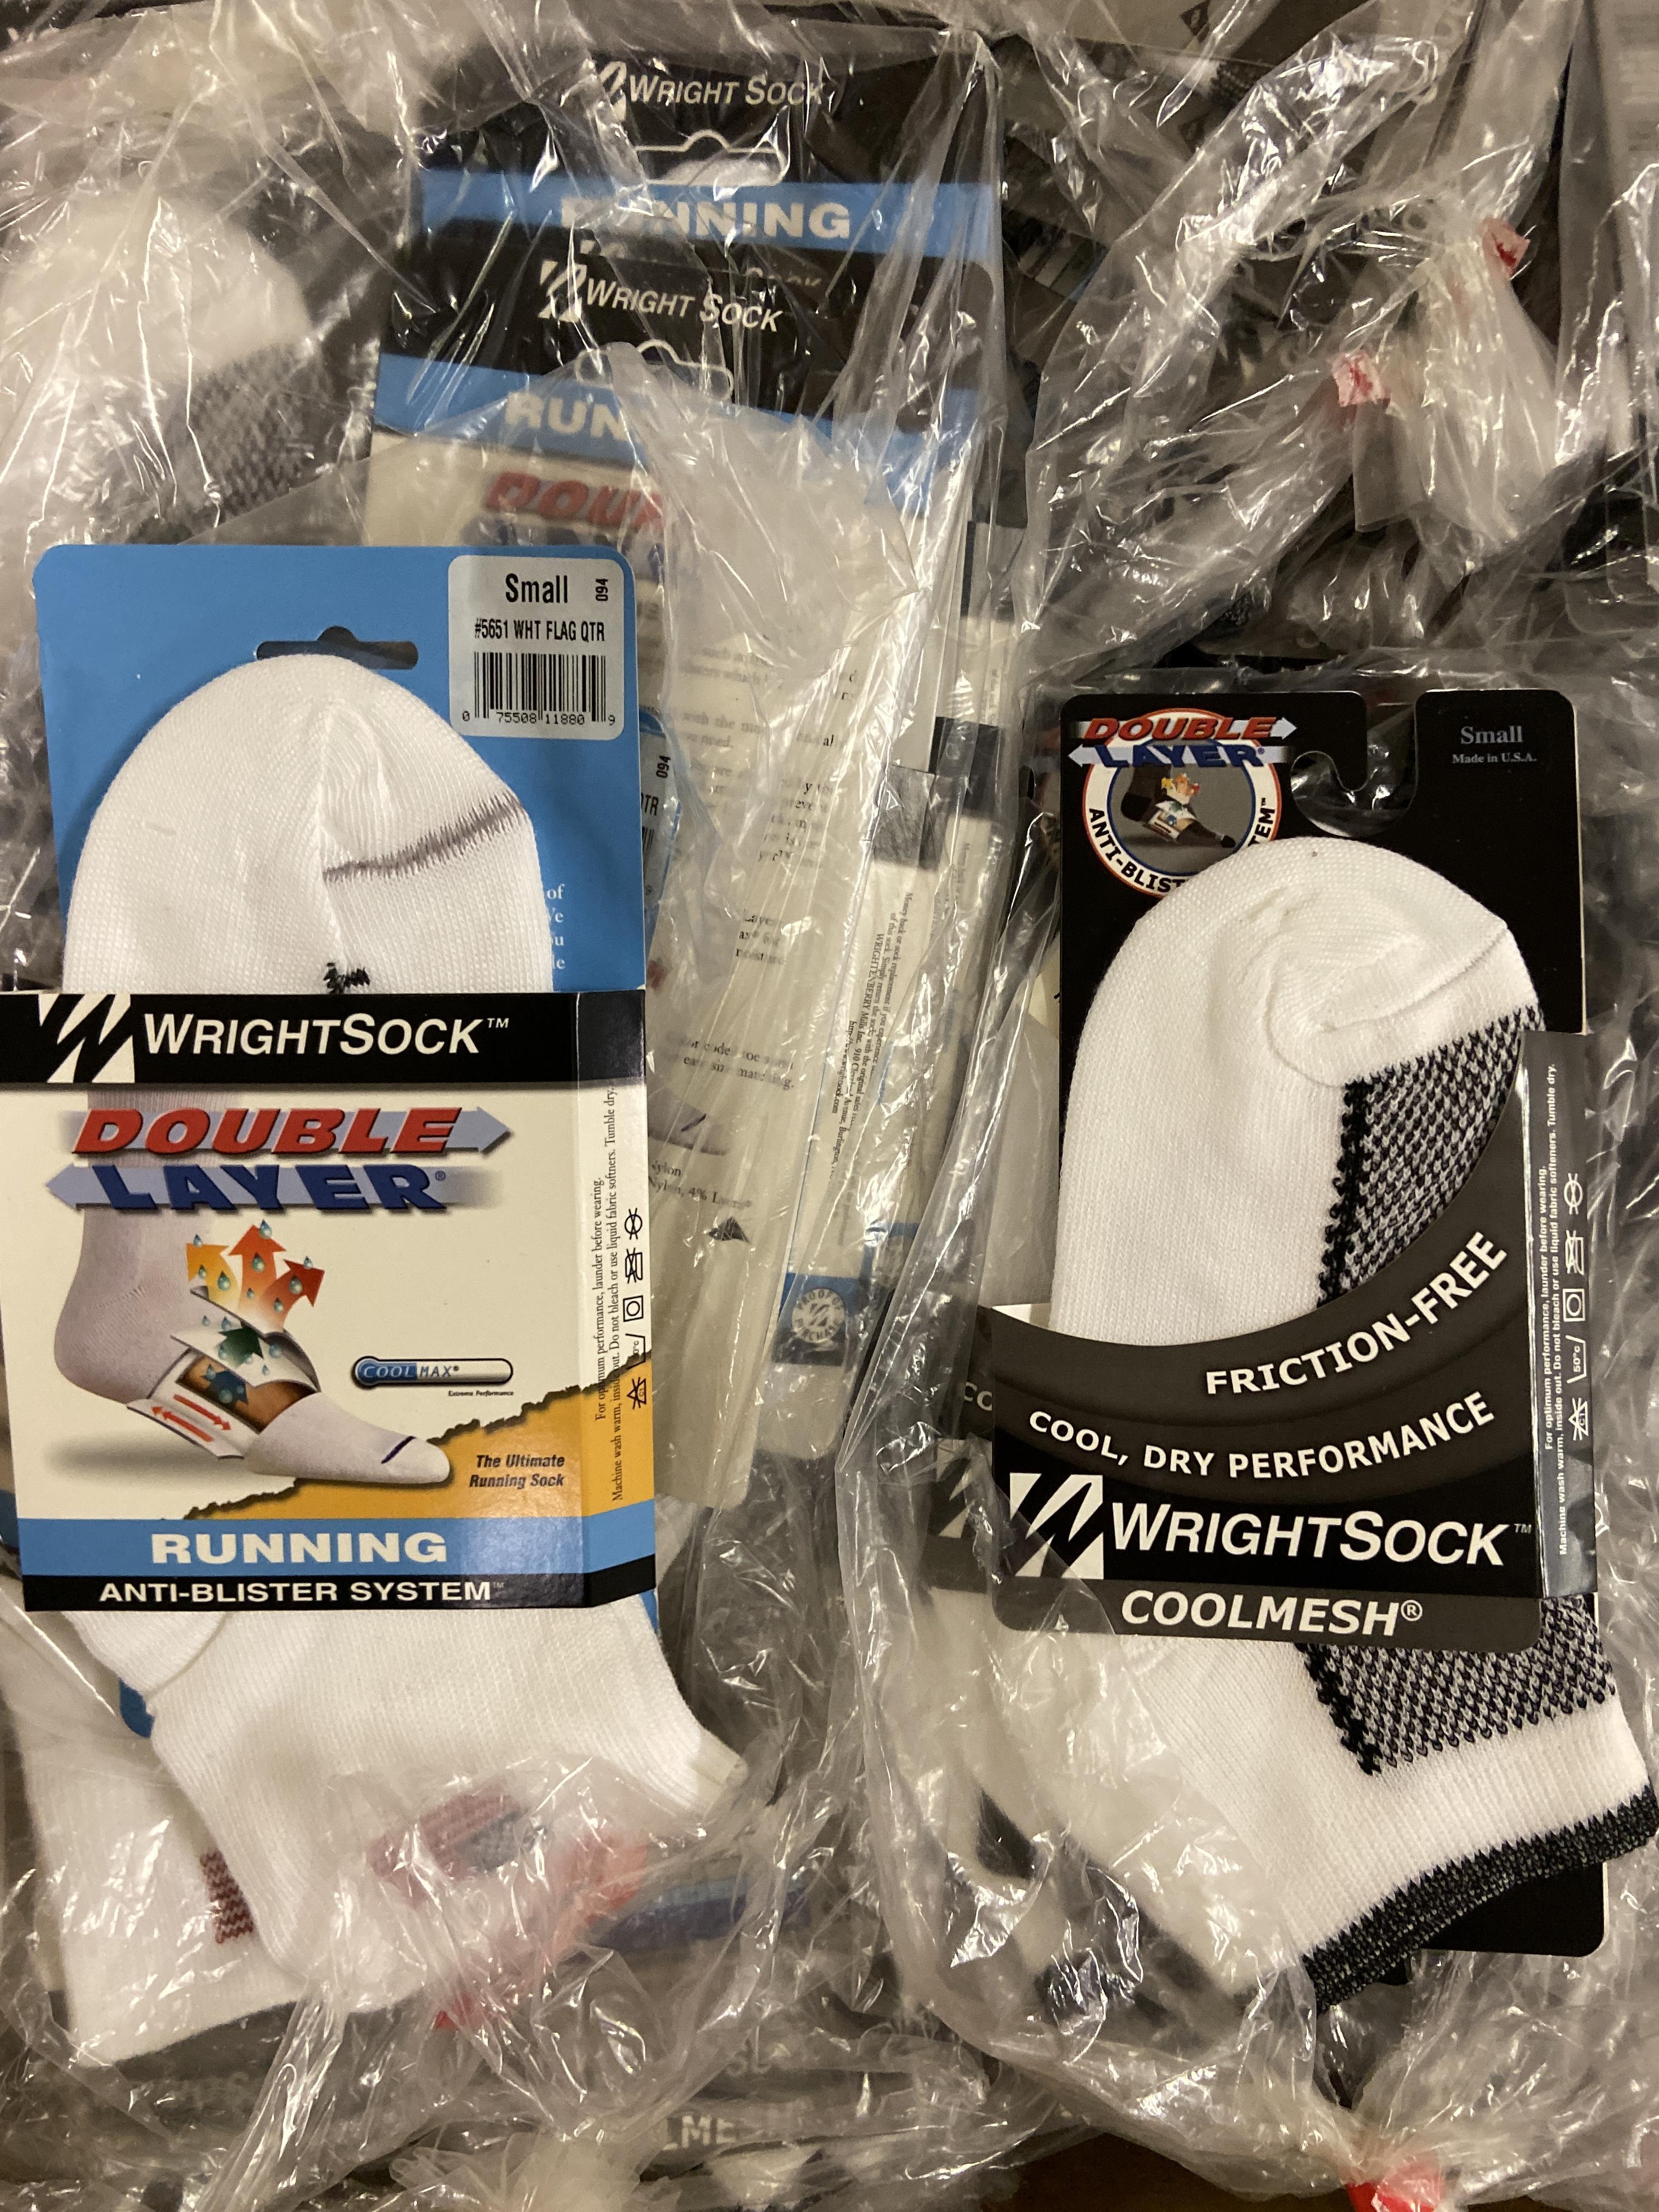 250+ packs of New Socks, Wrightsock Coolmesh & Running, Double Layer, USA America Flag, White/Black - Image 2 of 3